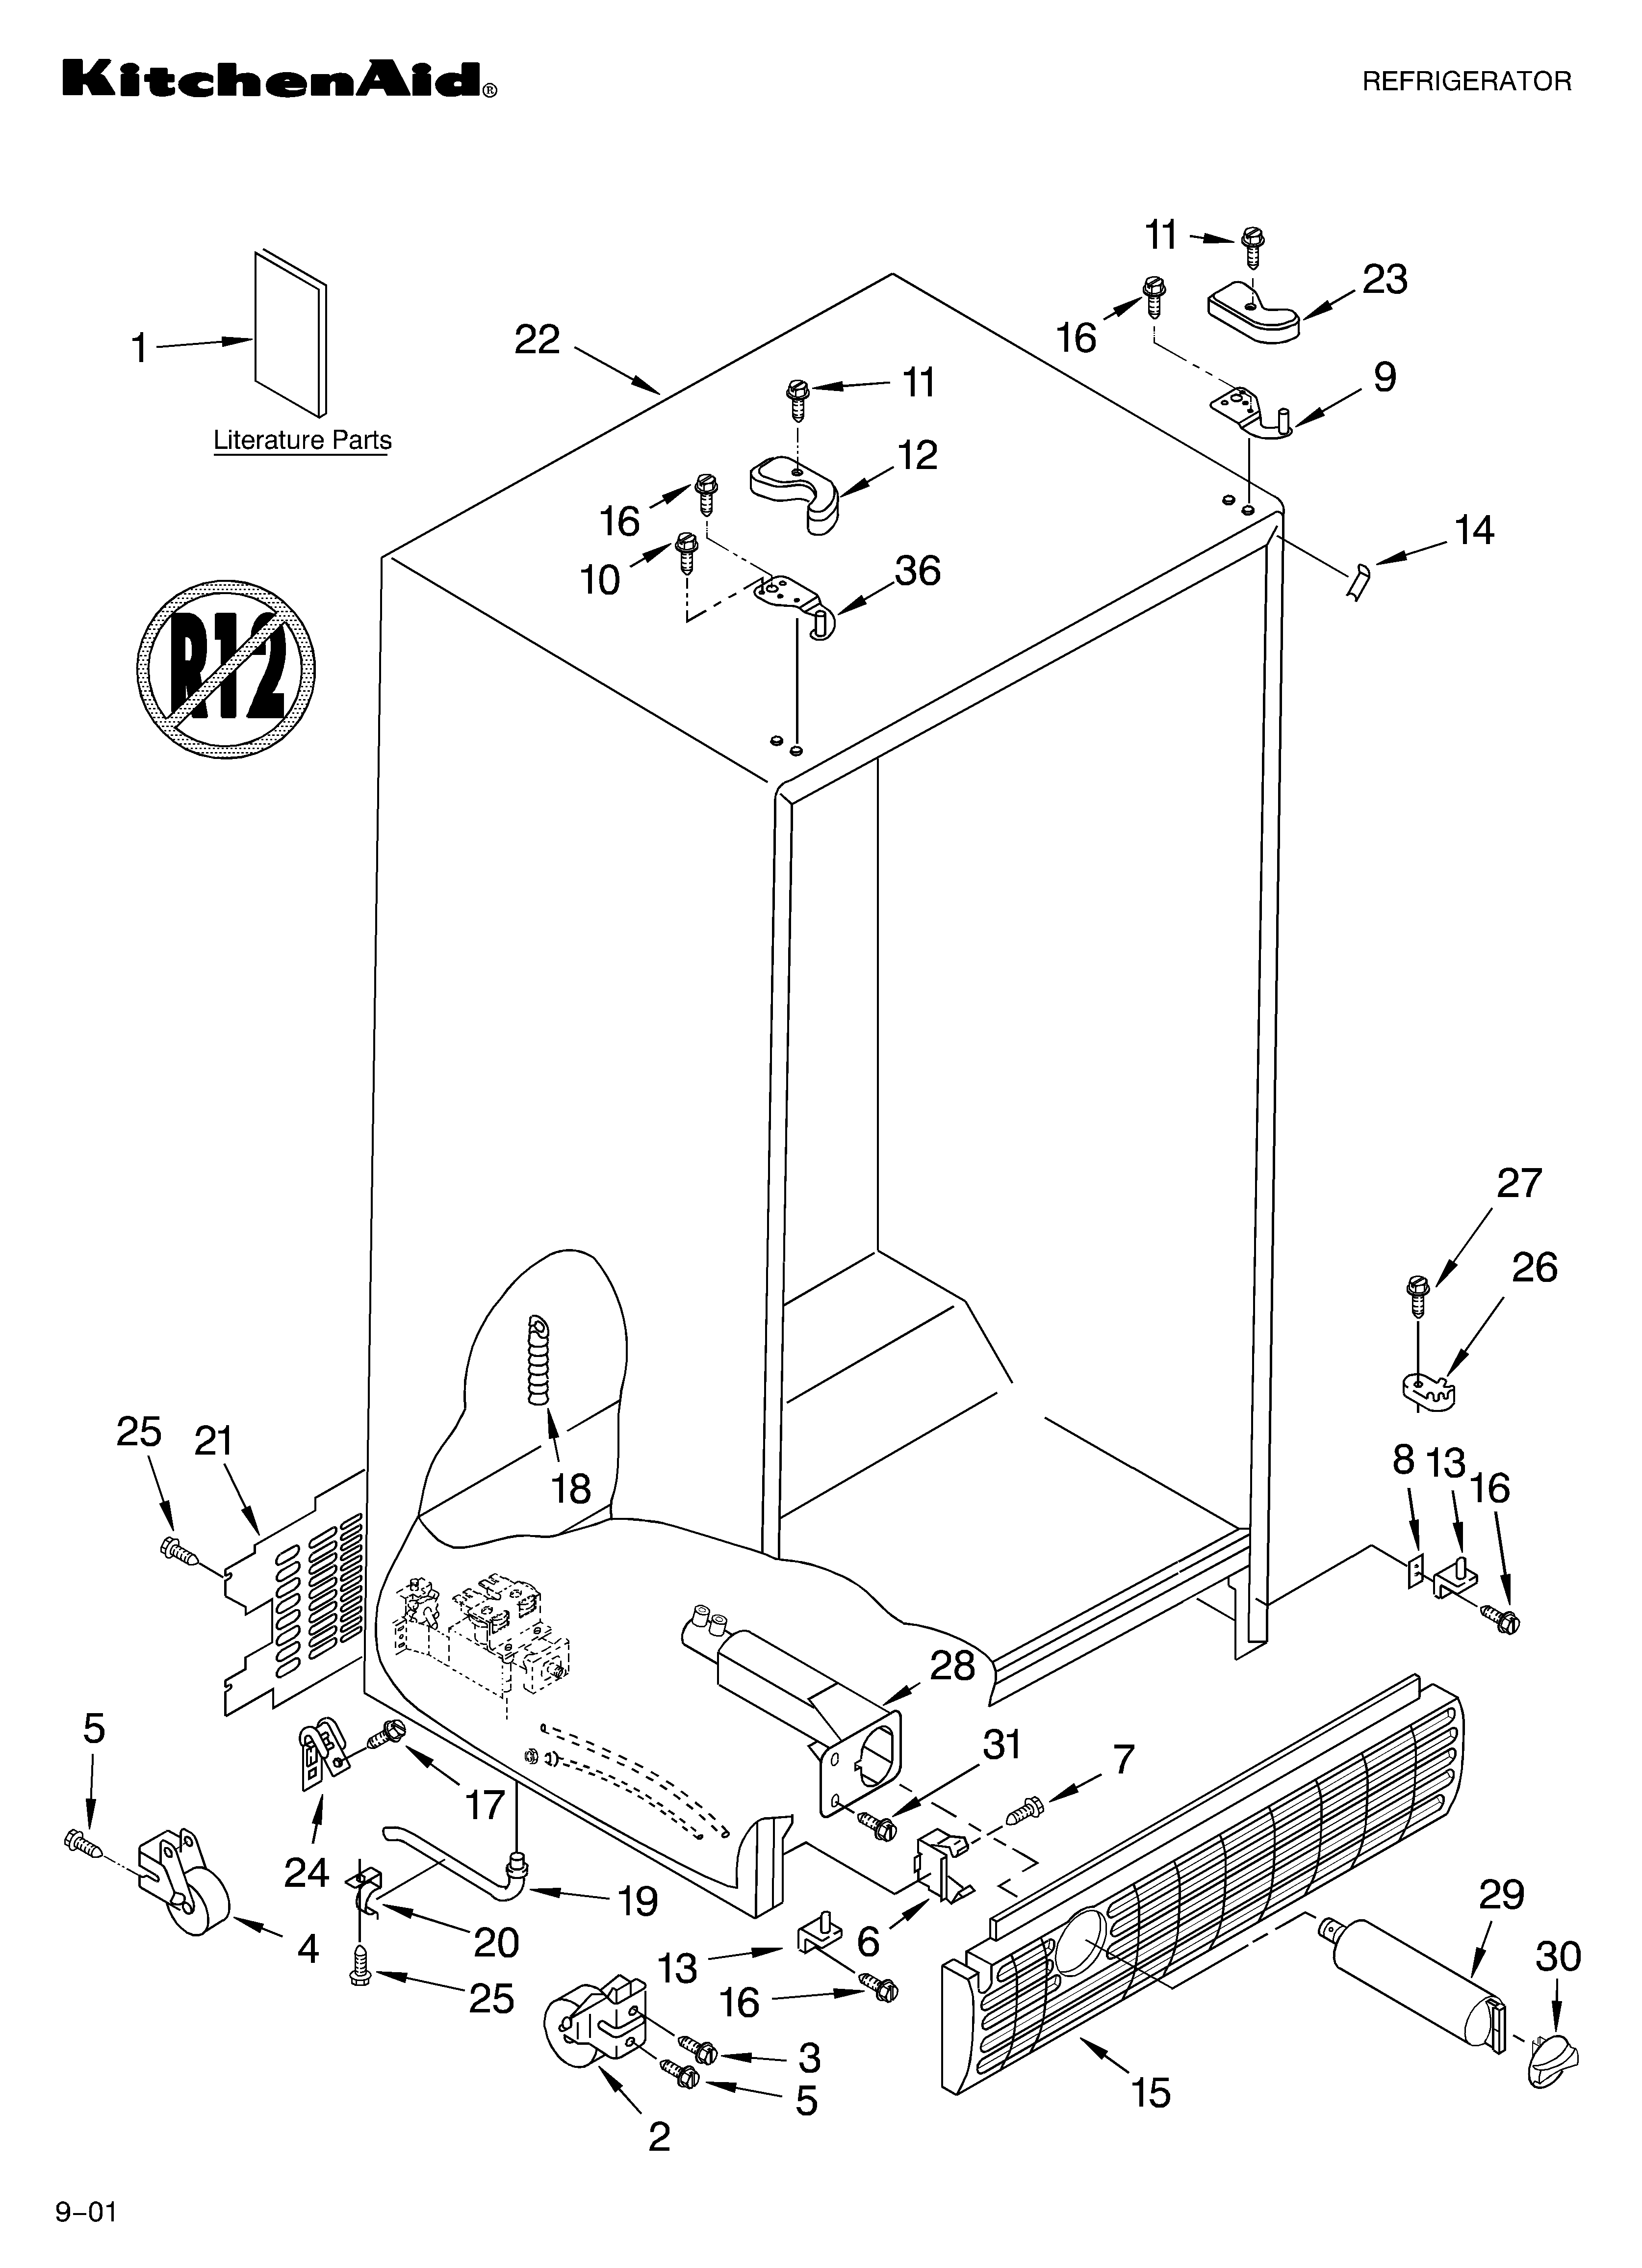 Cabinet Literature Diagram Amp Parts List For Model